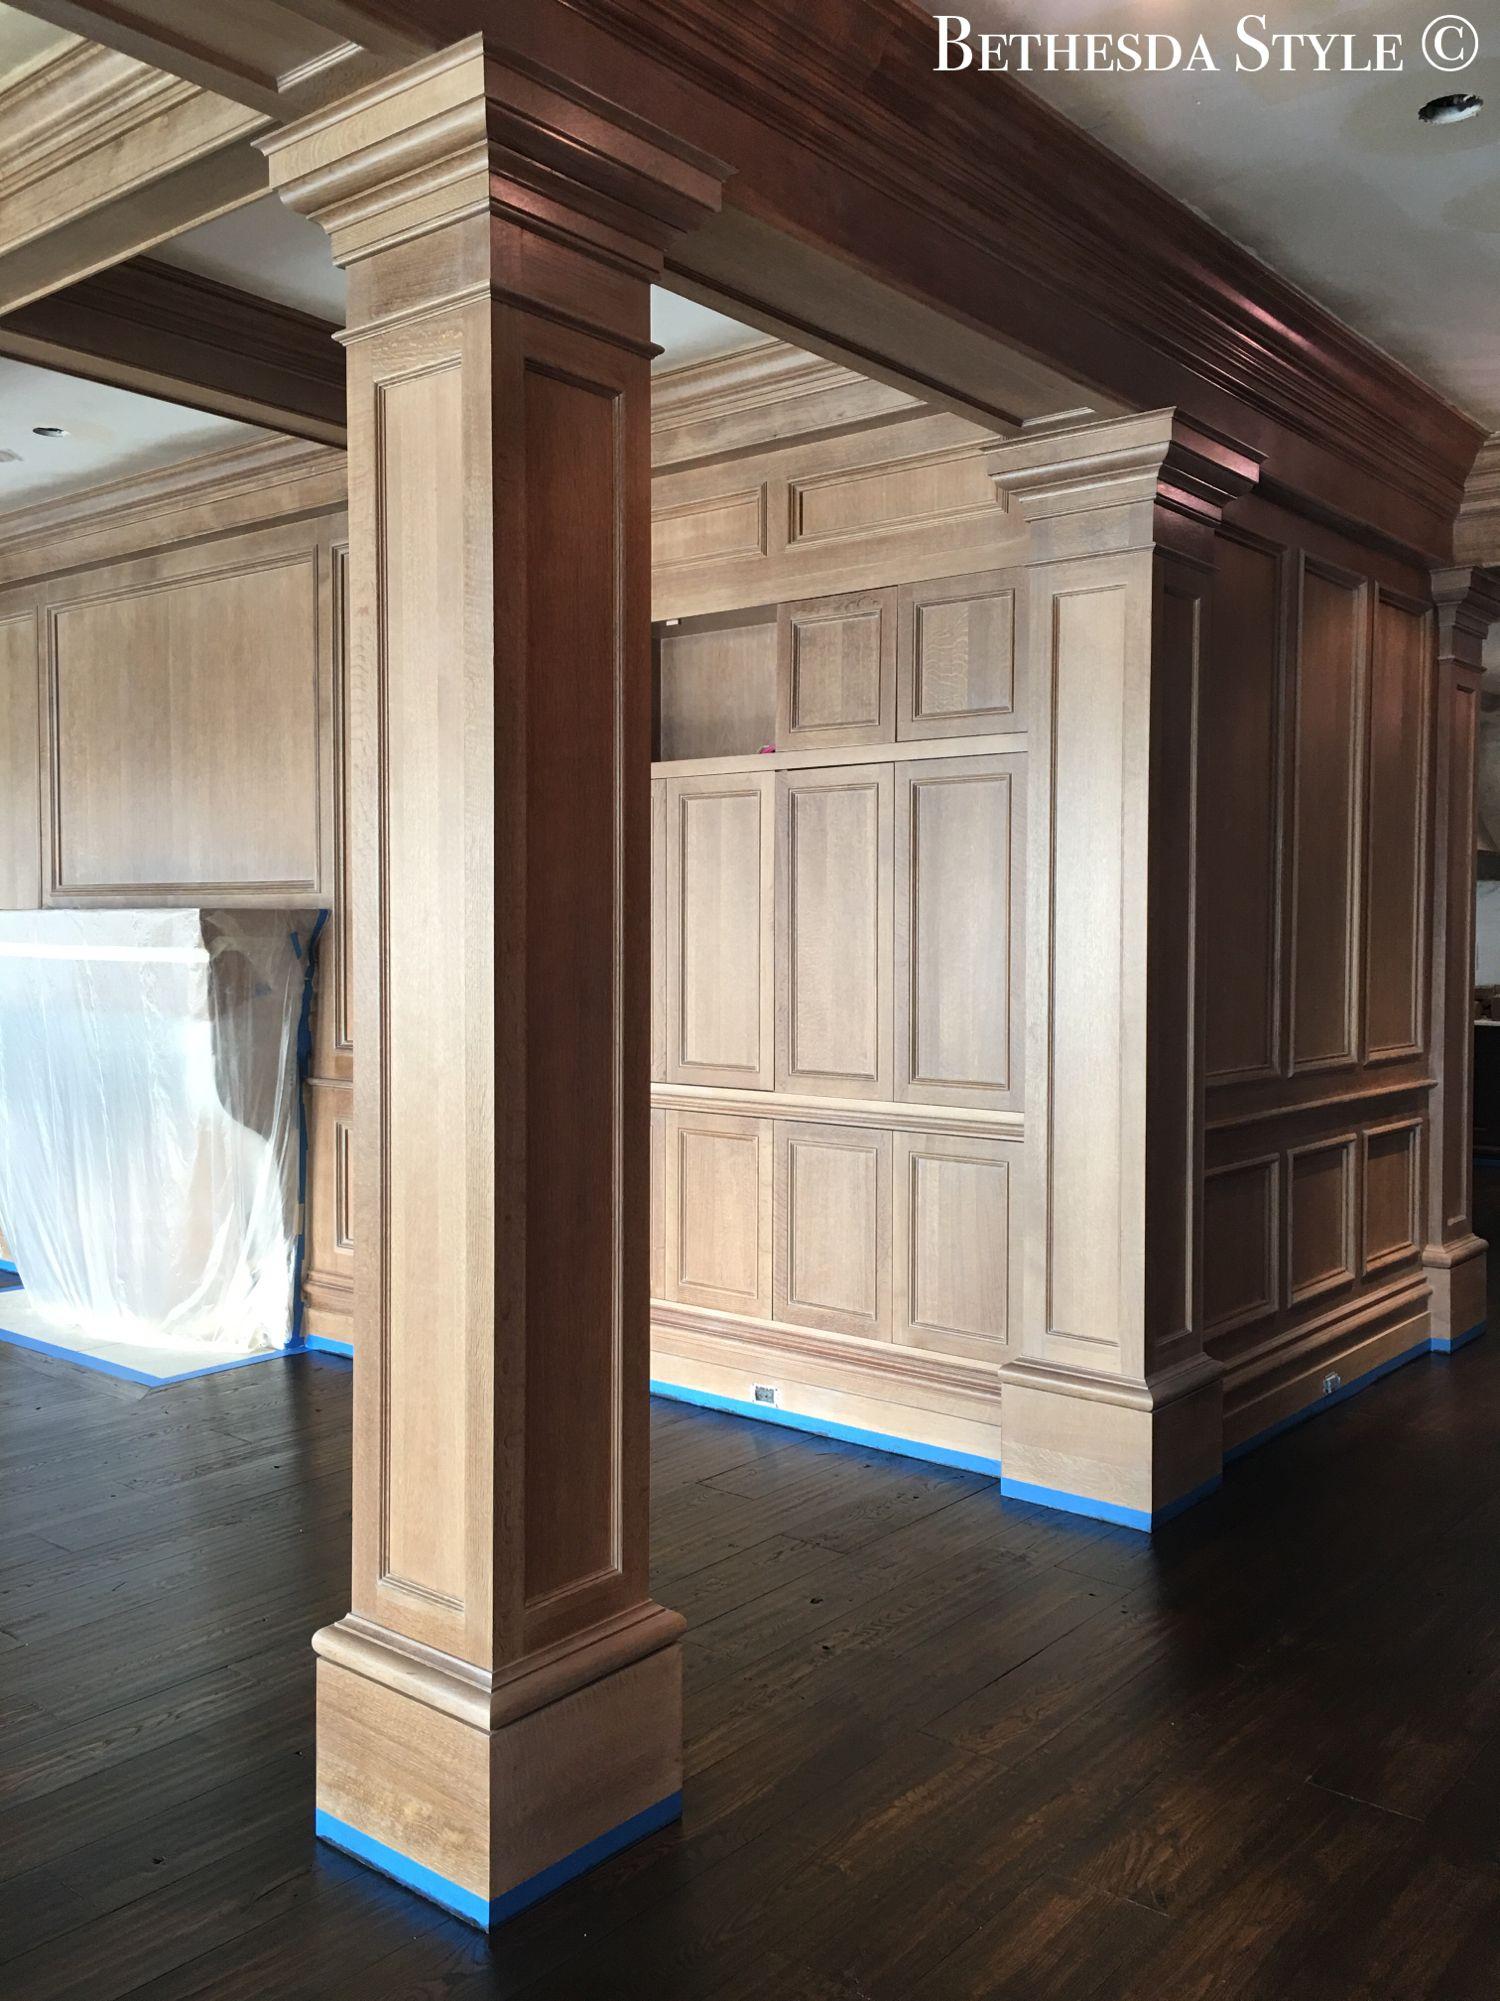 Wood Paneled Smoky Room: Great Room Columns